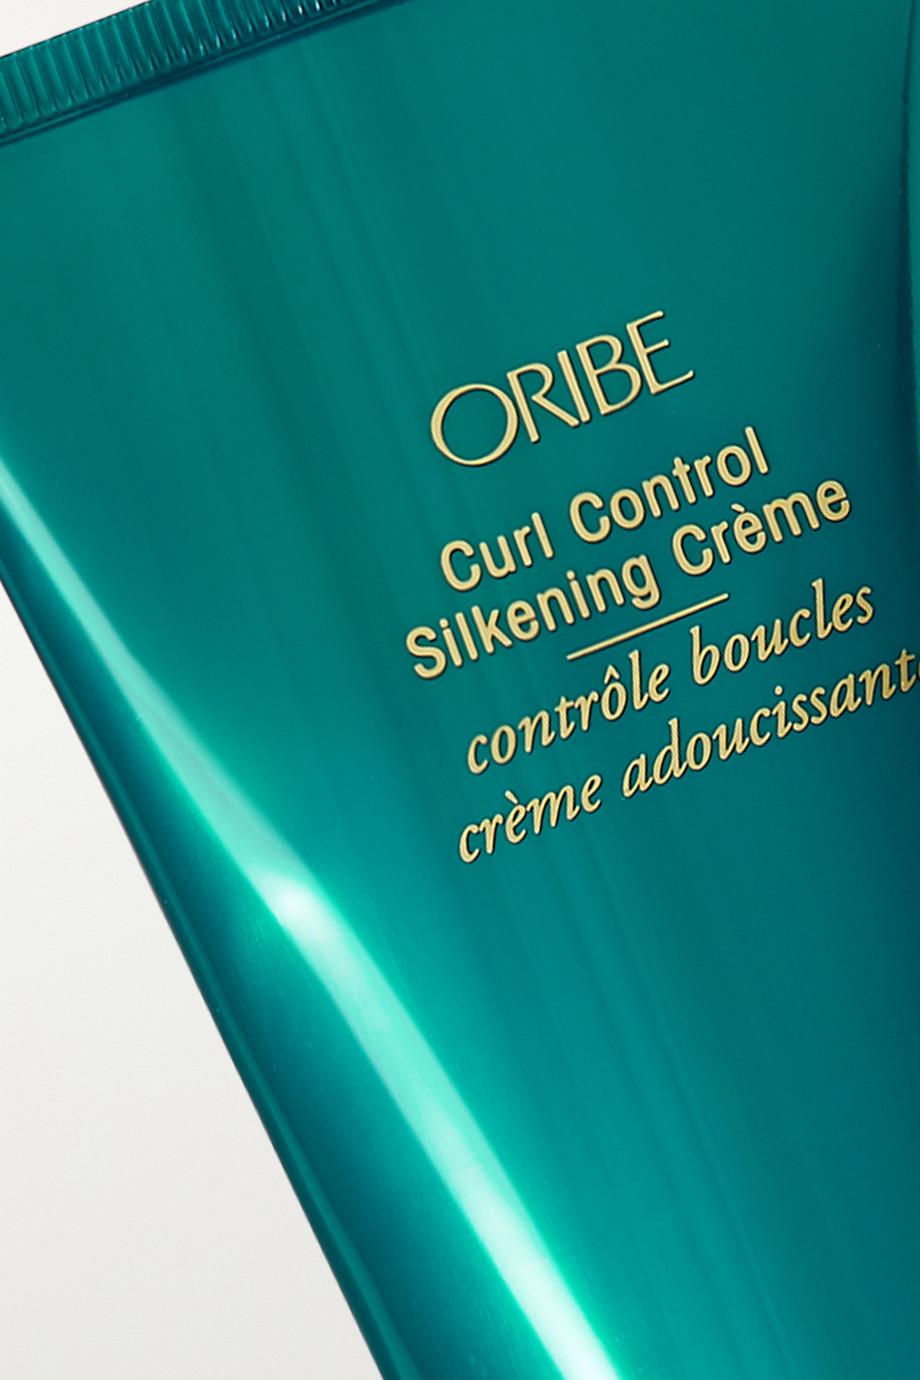 Oribe Curl Control Crème, 150ml